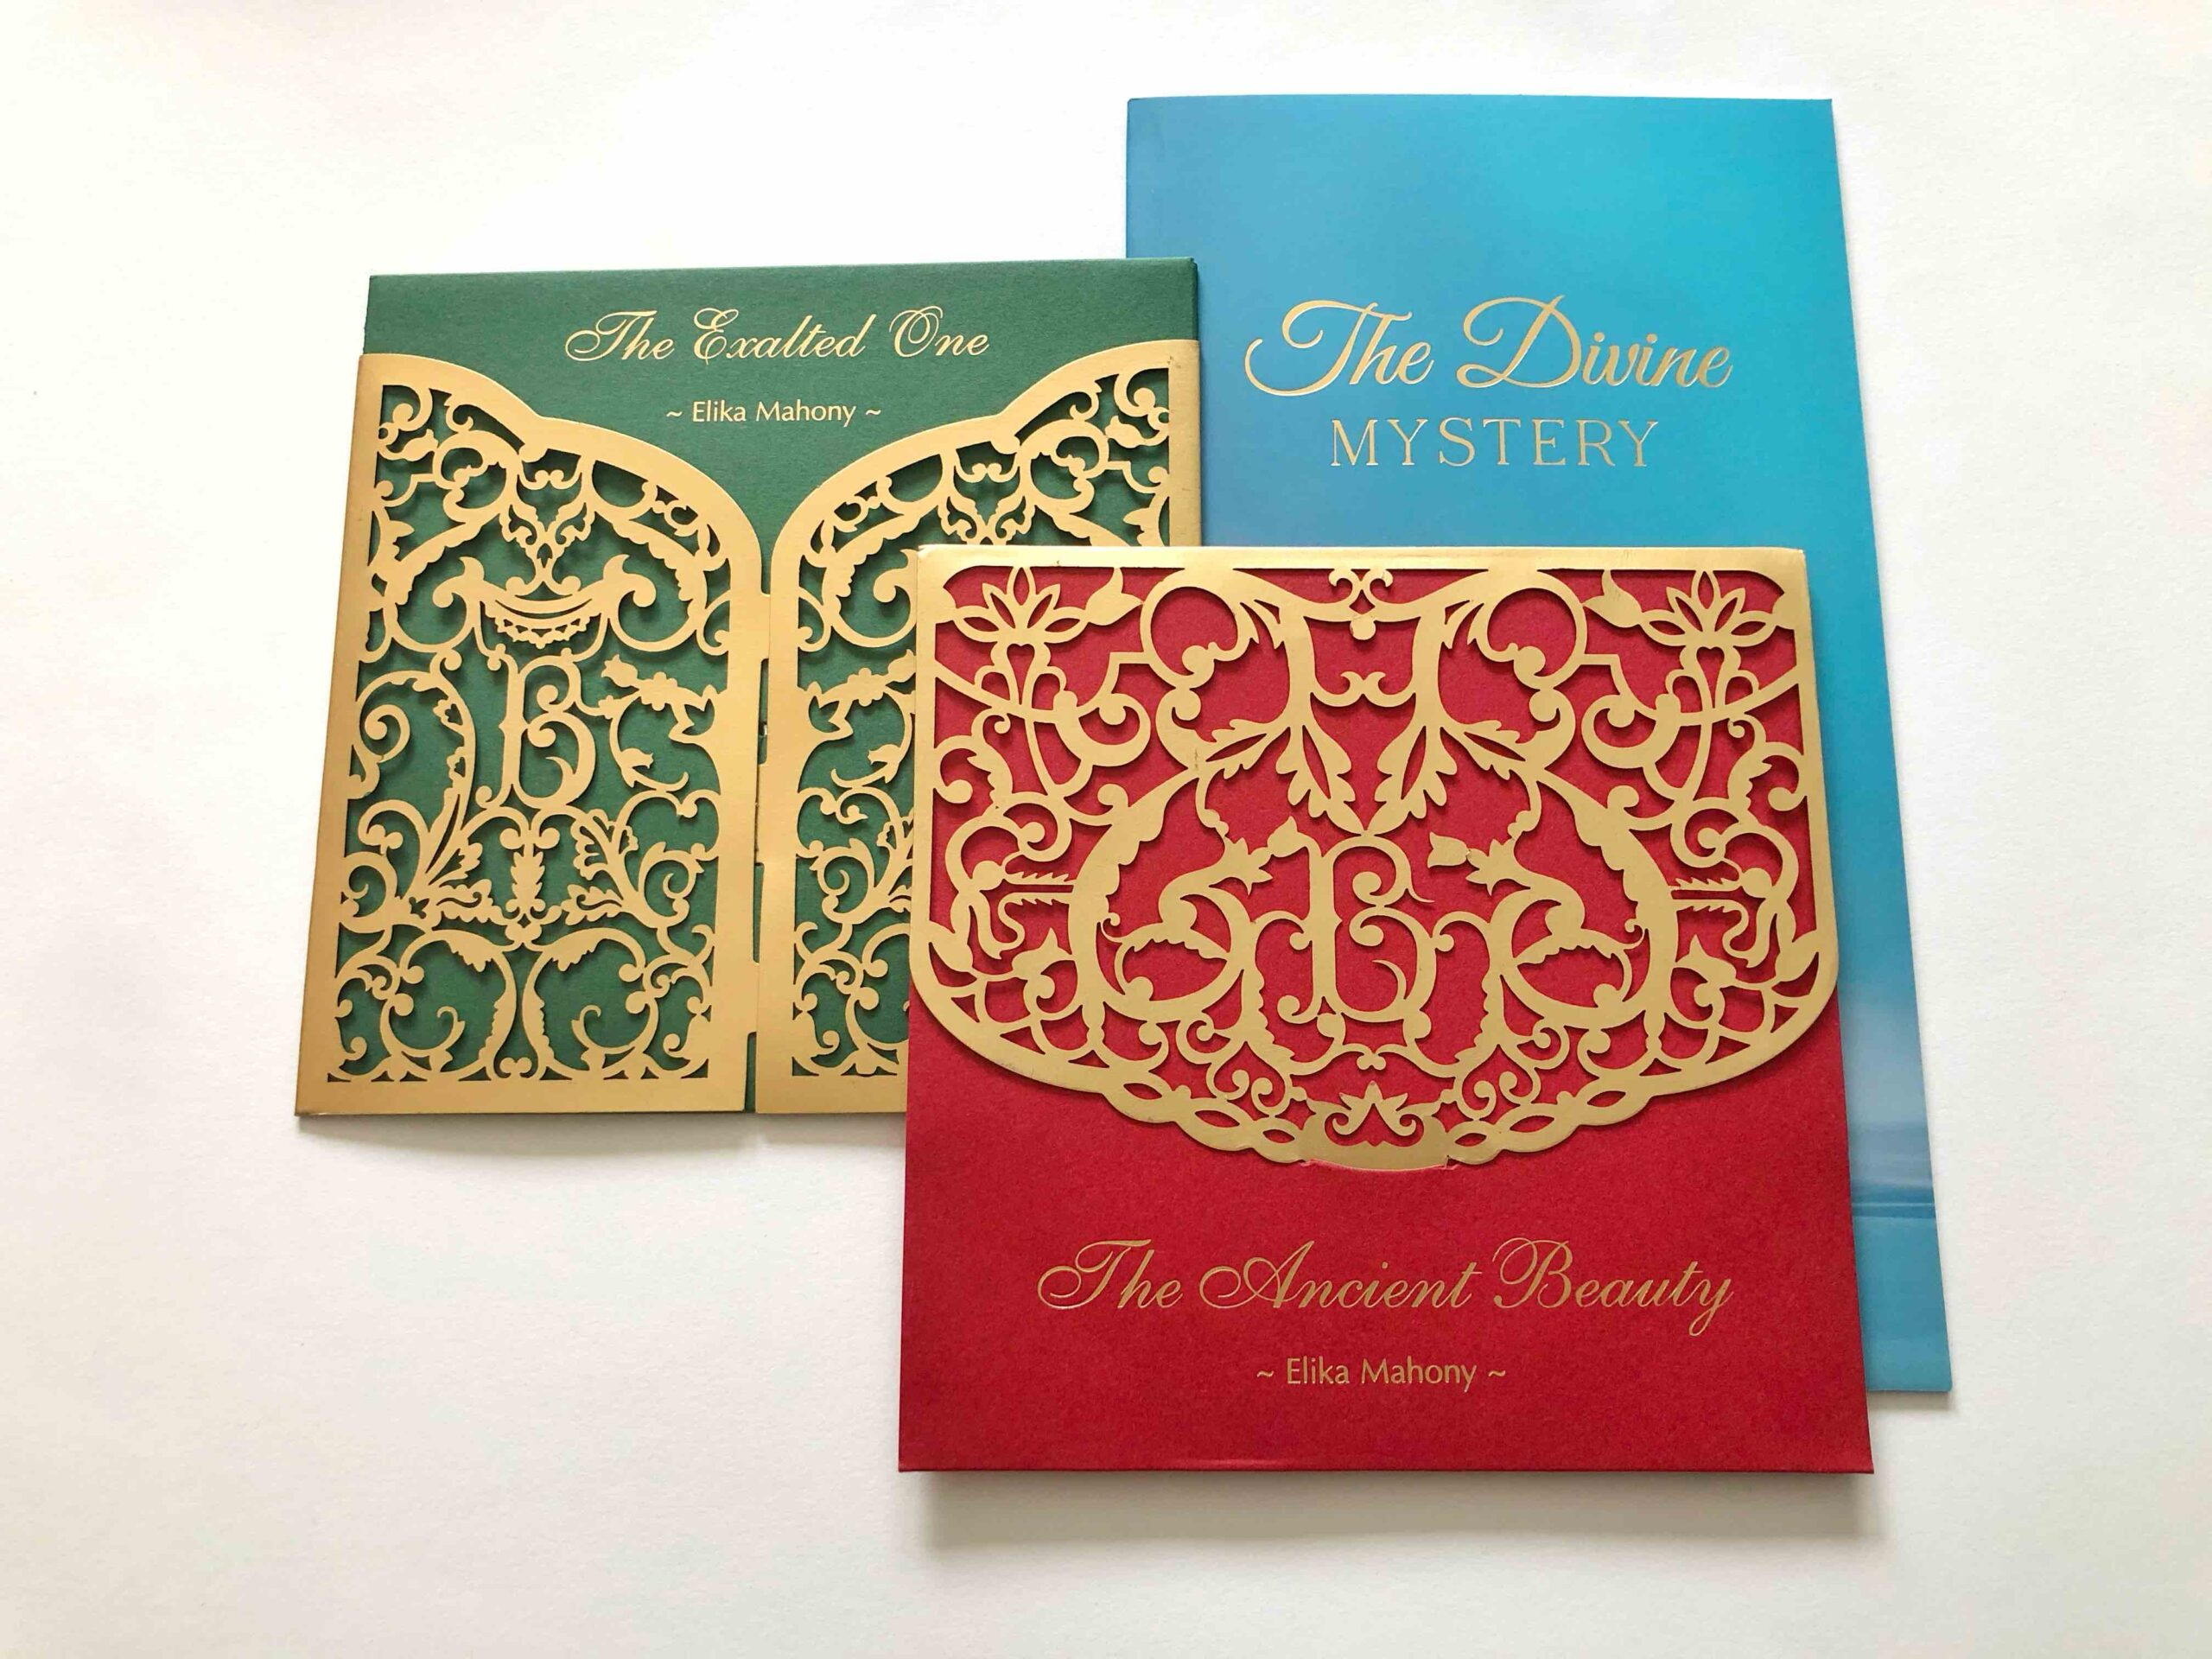 A Divine Trilogy – 3 albums for 3 Sacred figures in the Baha'i Faith